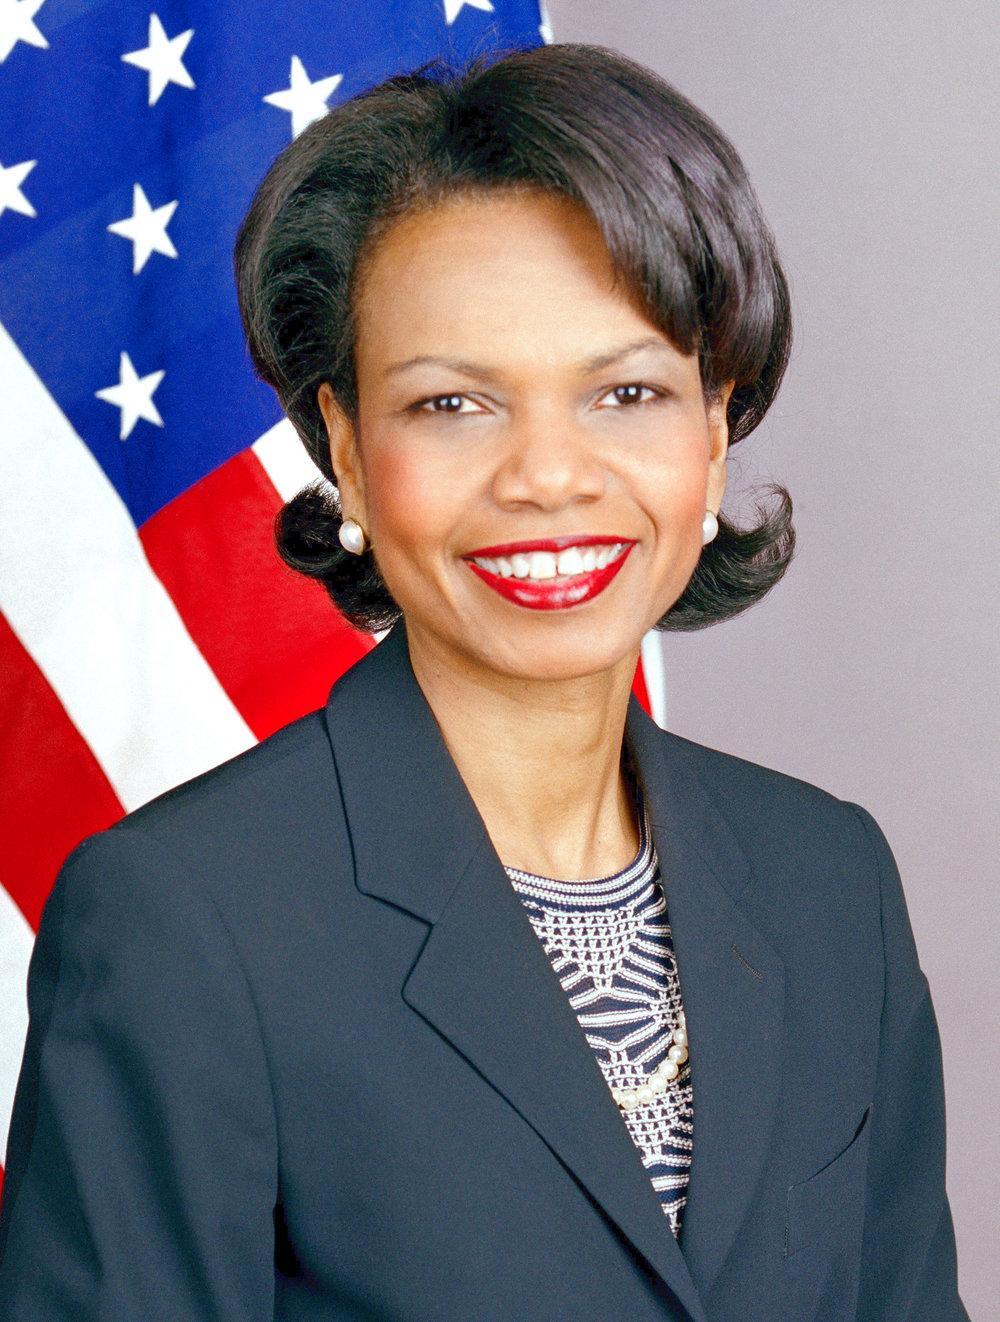 101 Condoleezza_Rice_cropped.jpg